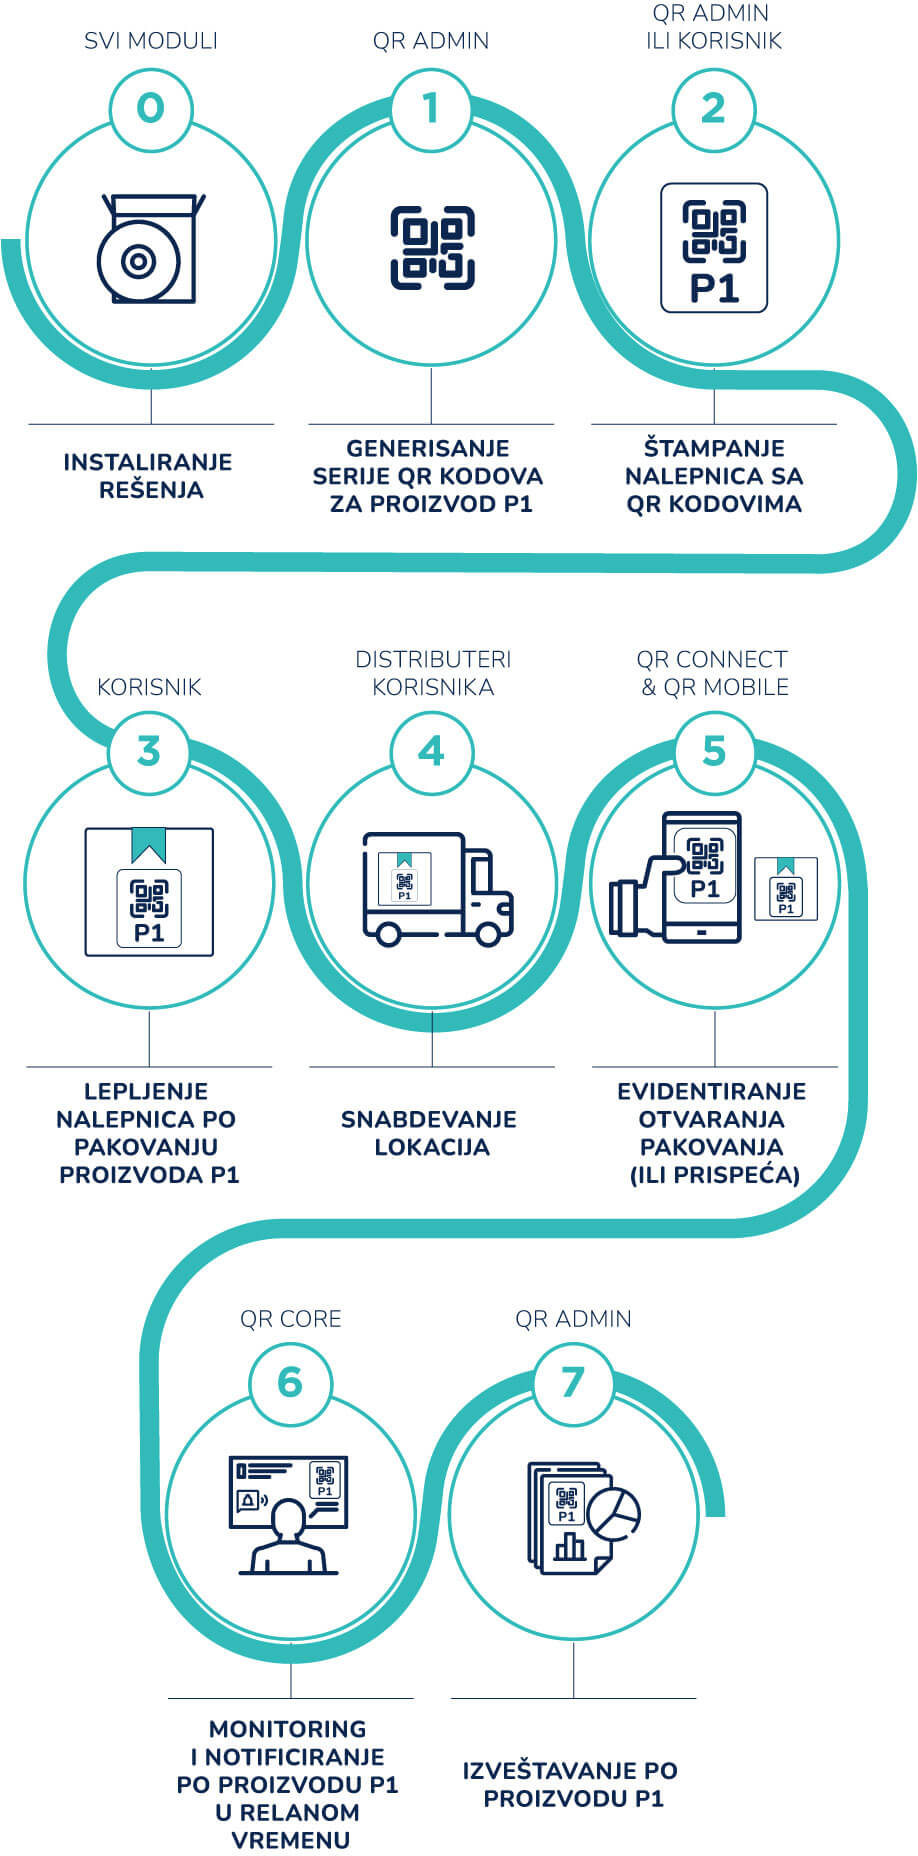 SQRE-poslovni-proces-mobile (1)